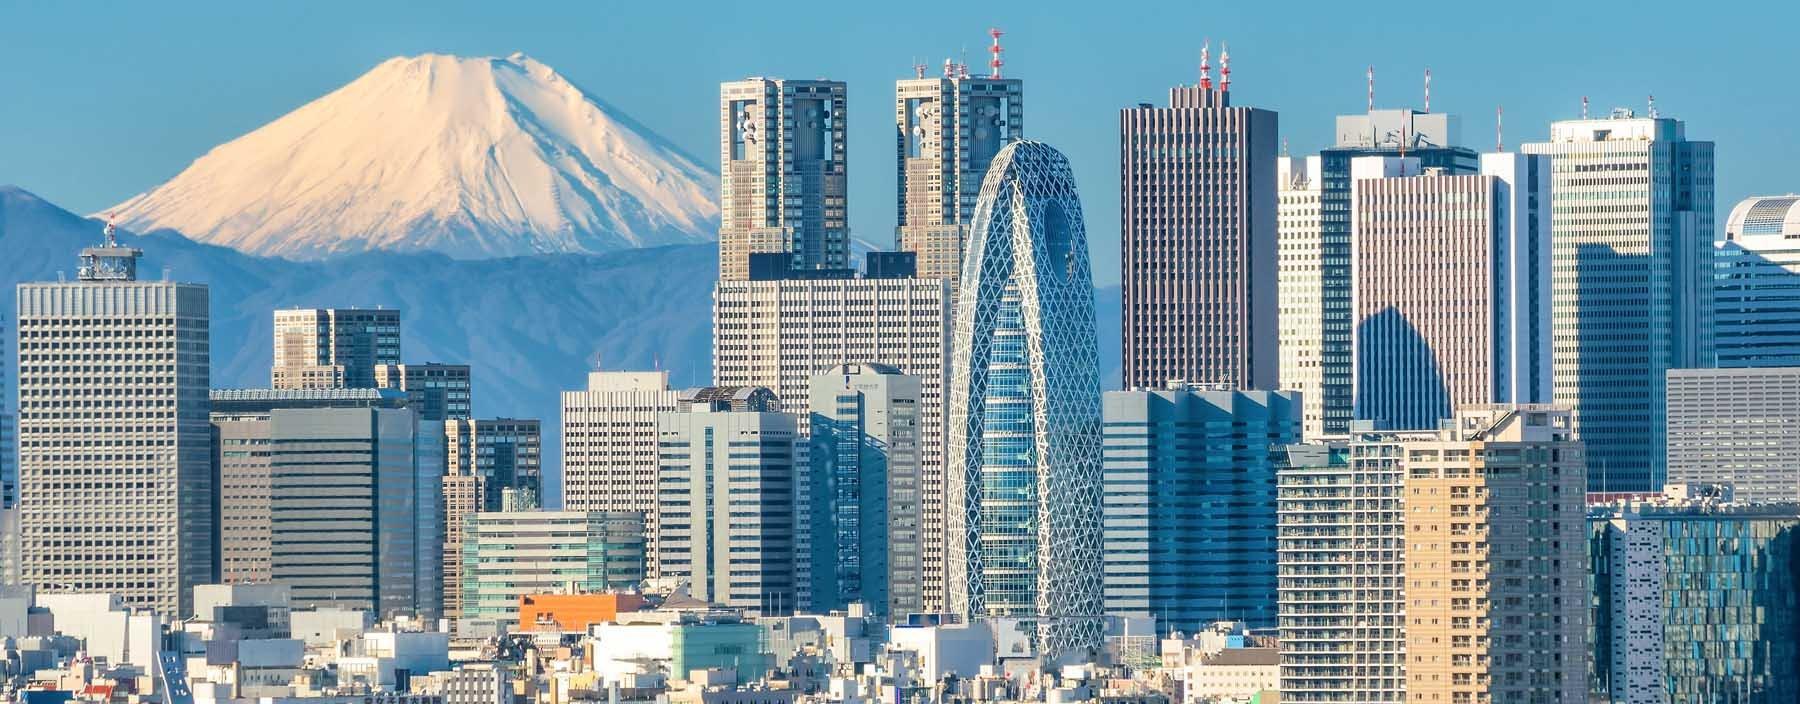 jp, tokyo, skyline and mountain fuji.jpg